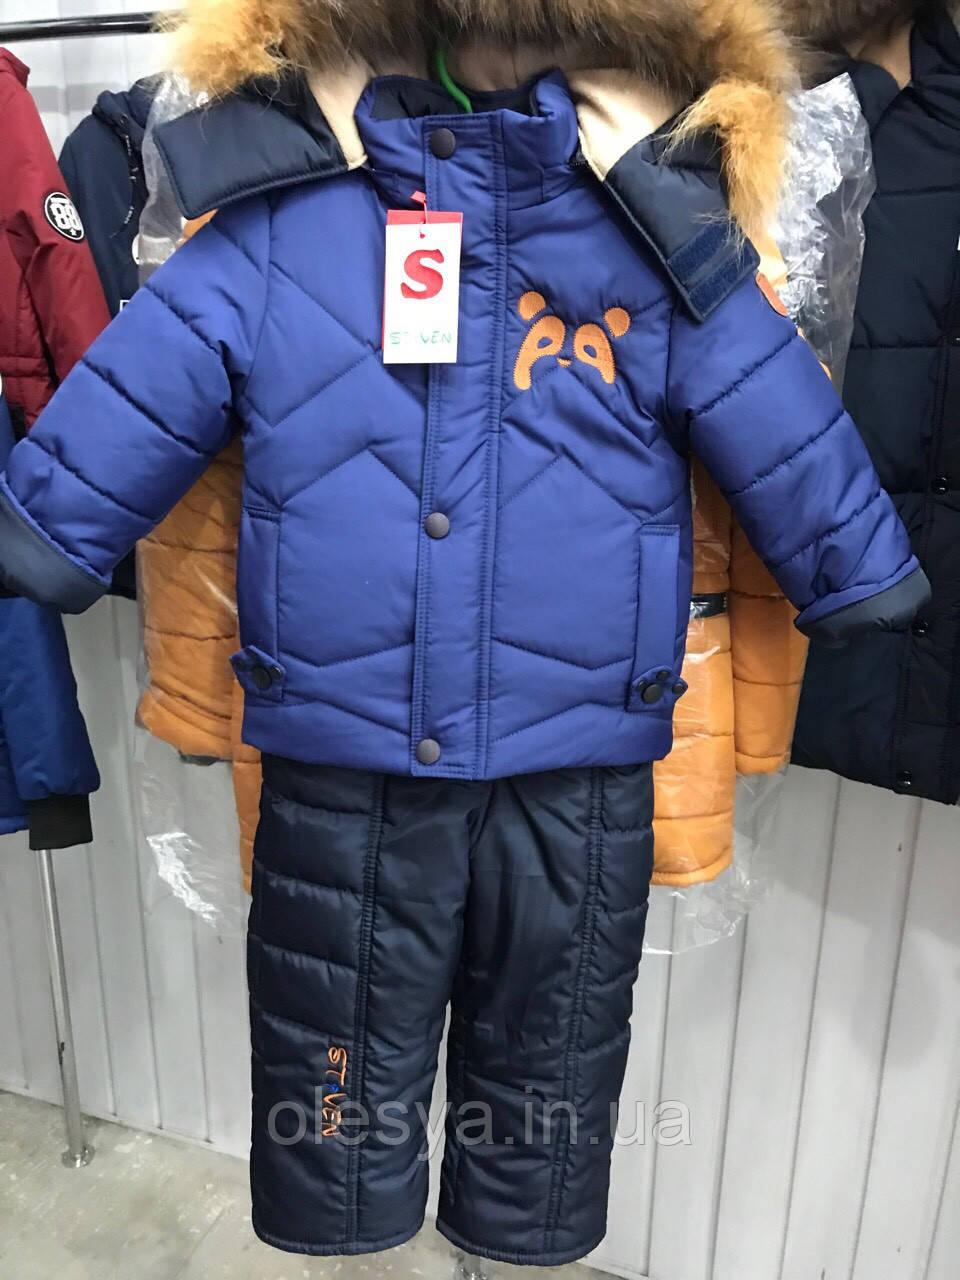 Детский зимний комбинезон на мальчика Панда Размеры 86- 104